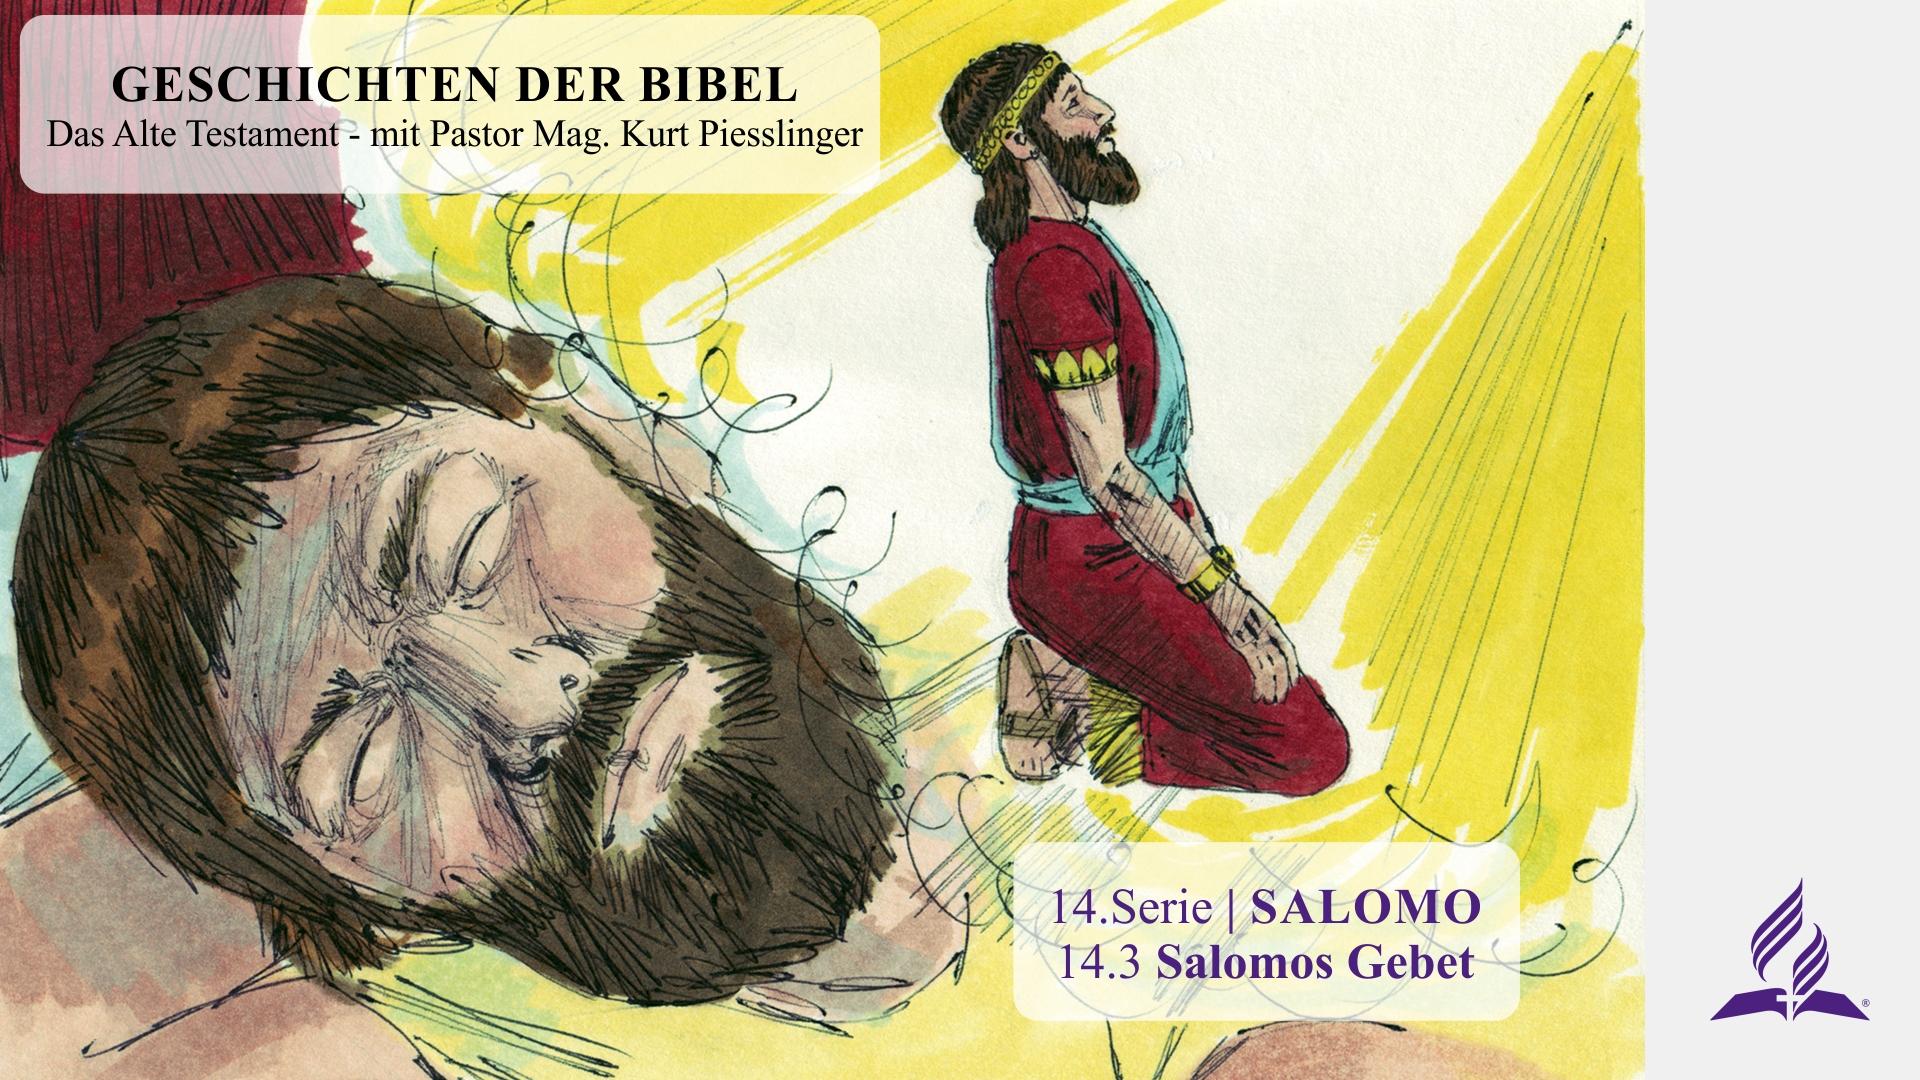 14.3 Salomos Gebet – 14.SALOMO | Pastor Mag. Kurt Piesslinger